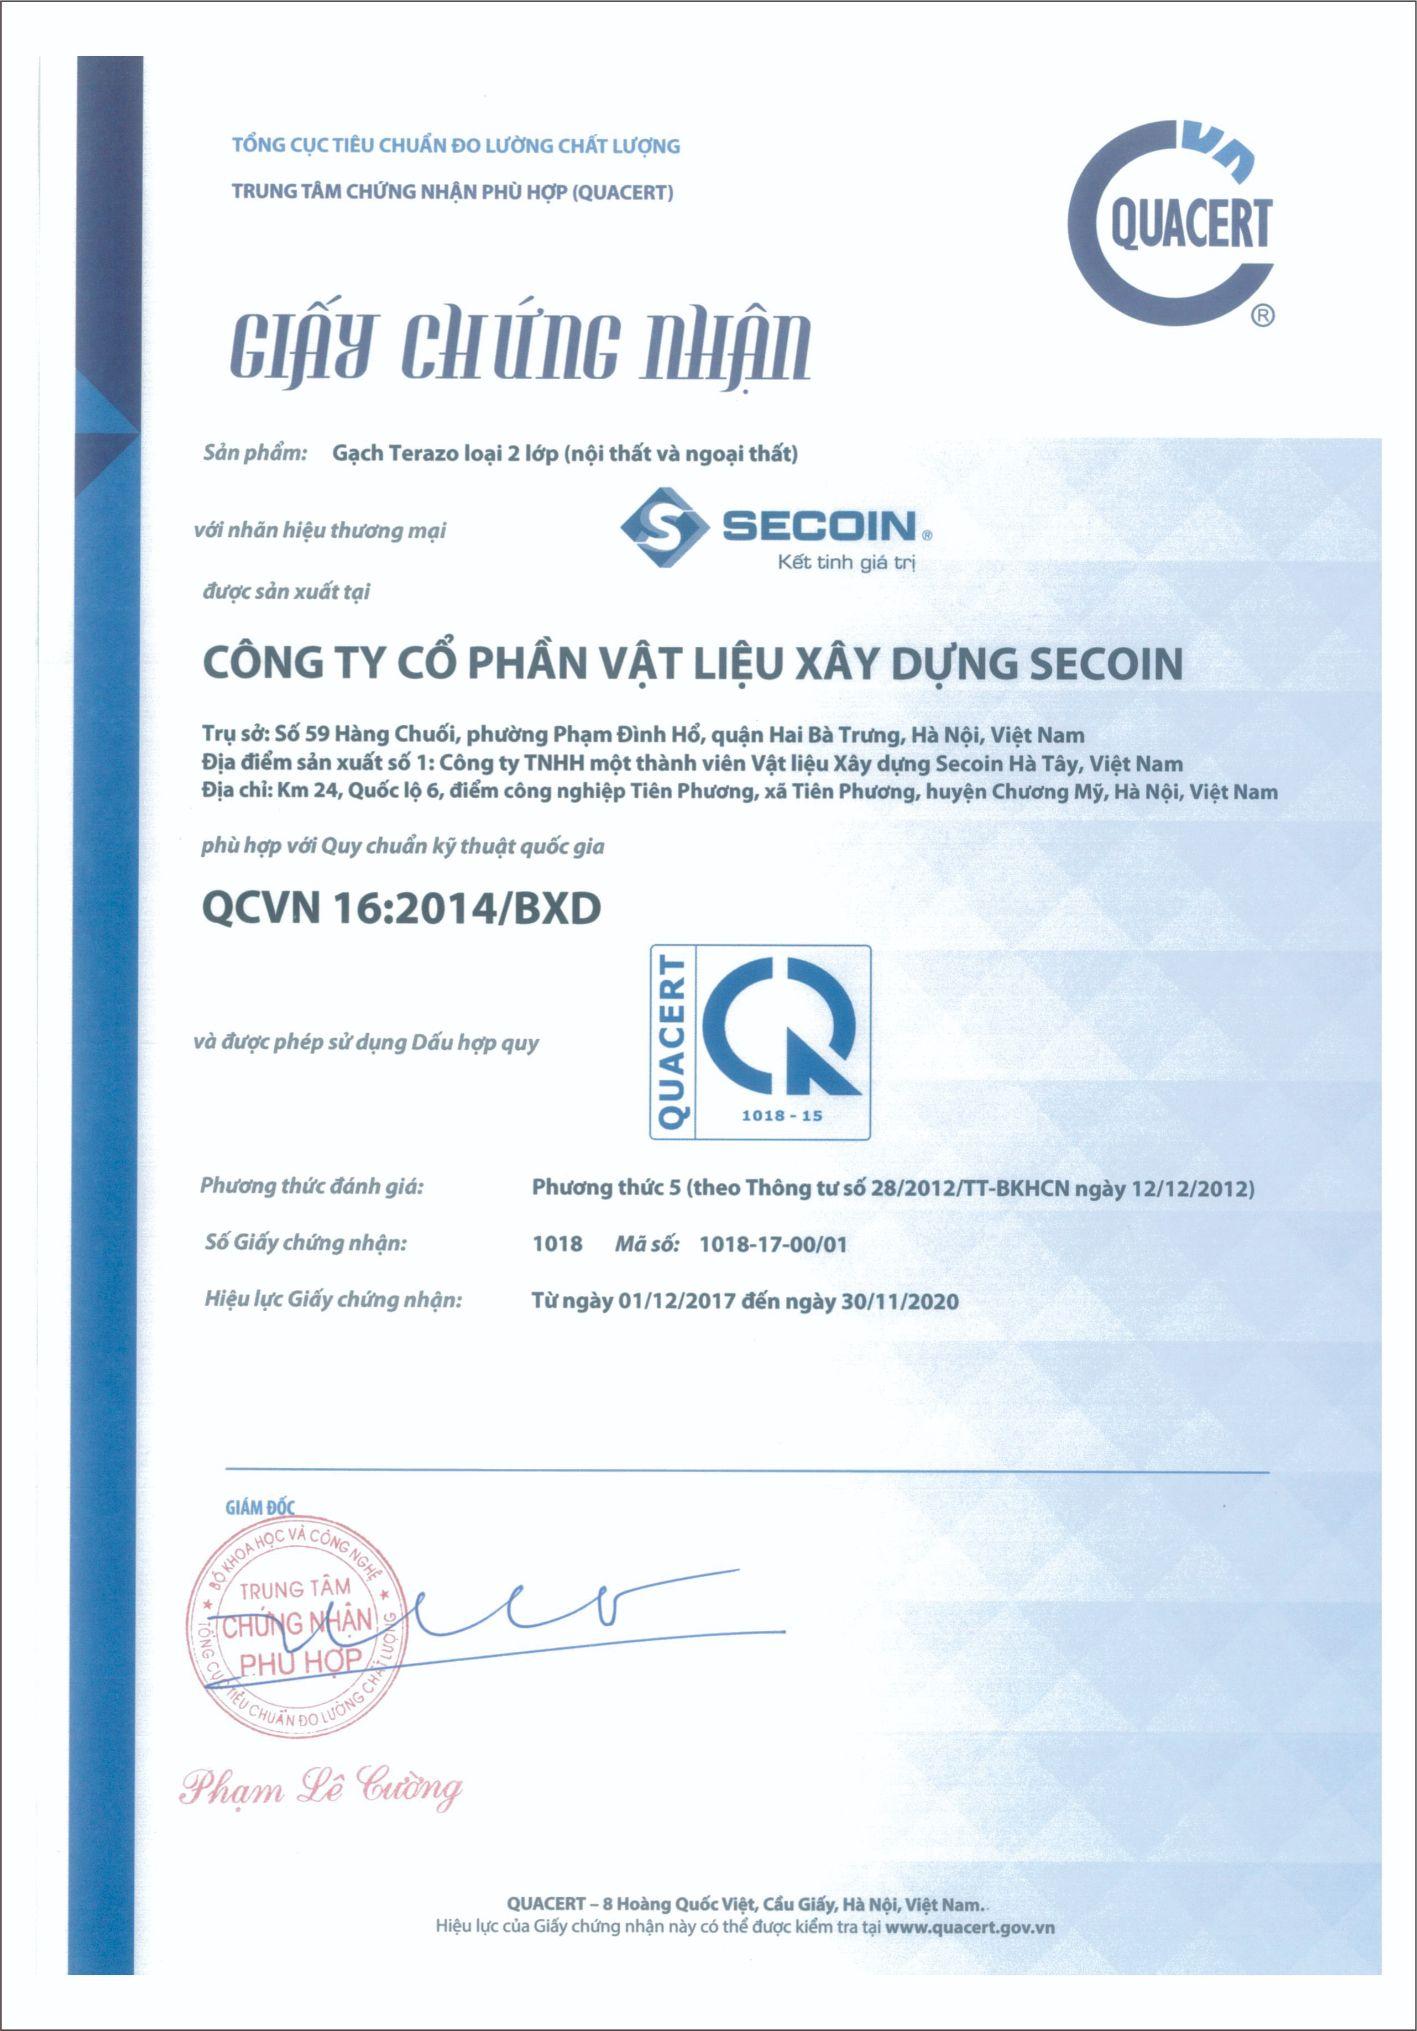 National Standards Compliance